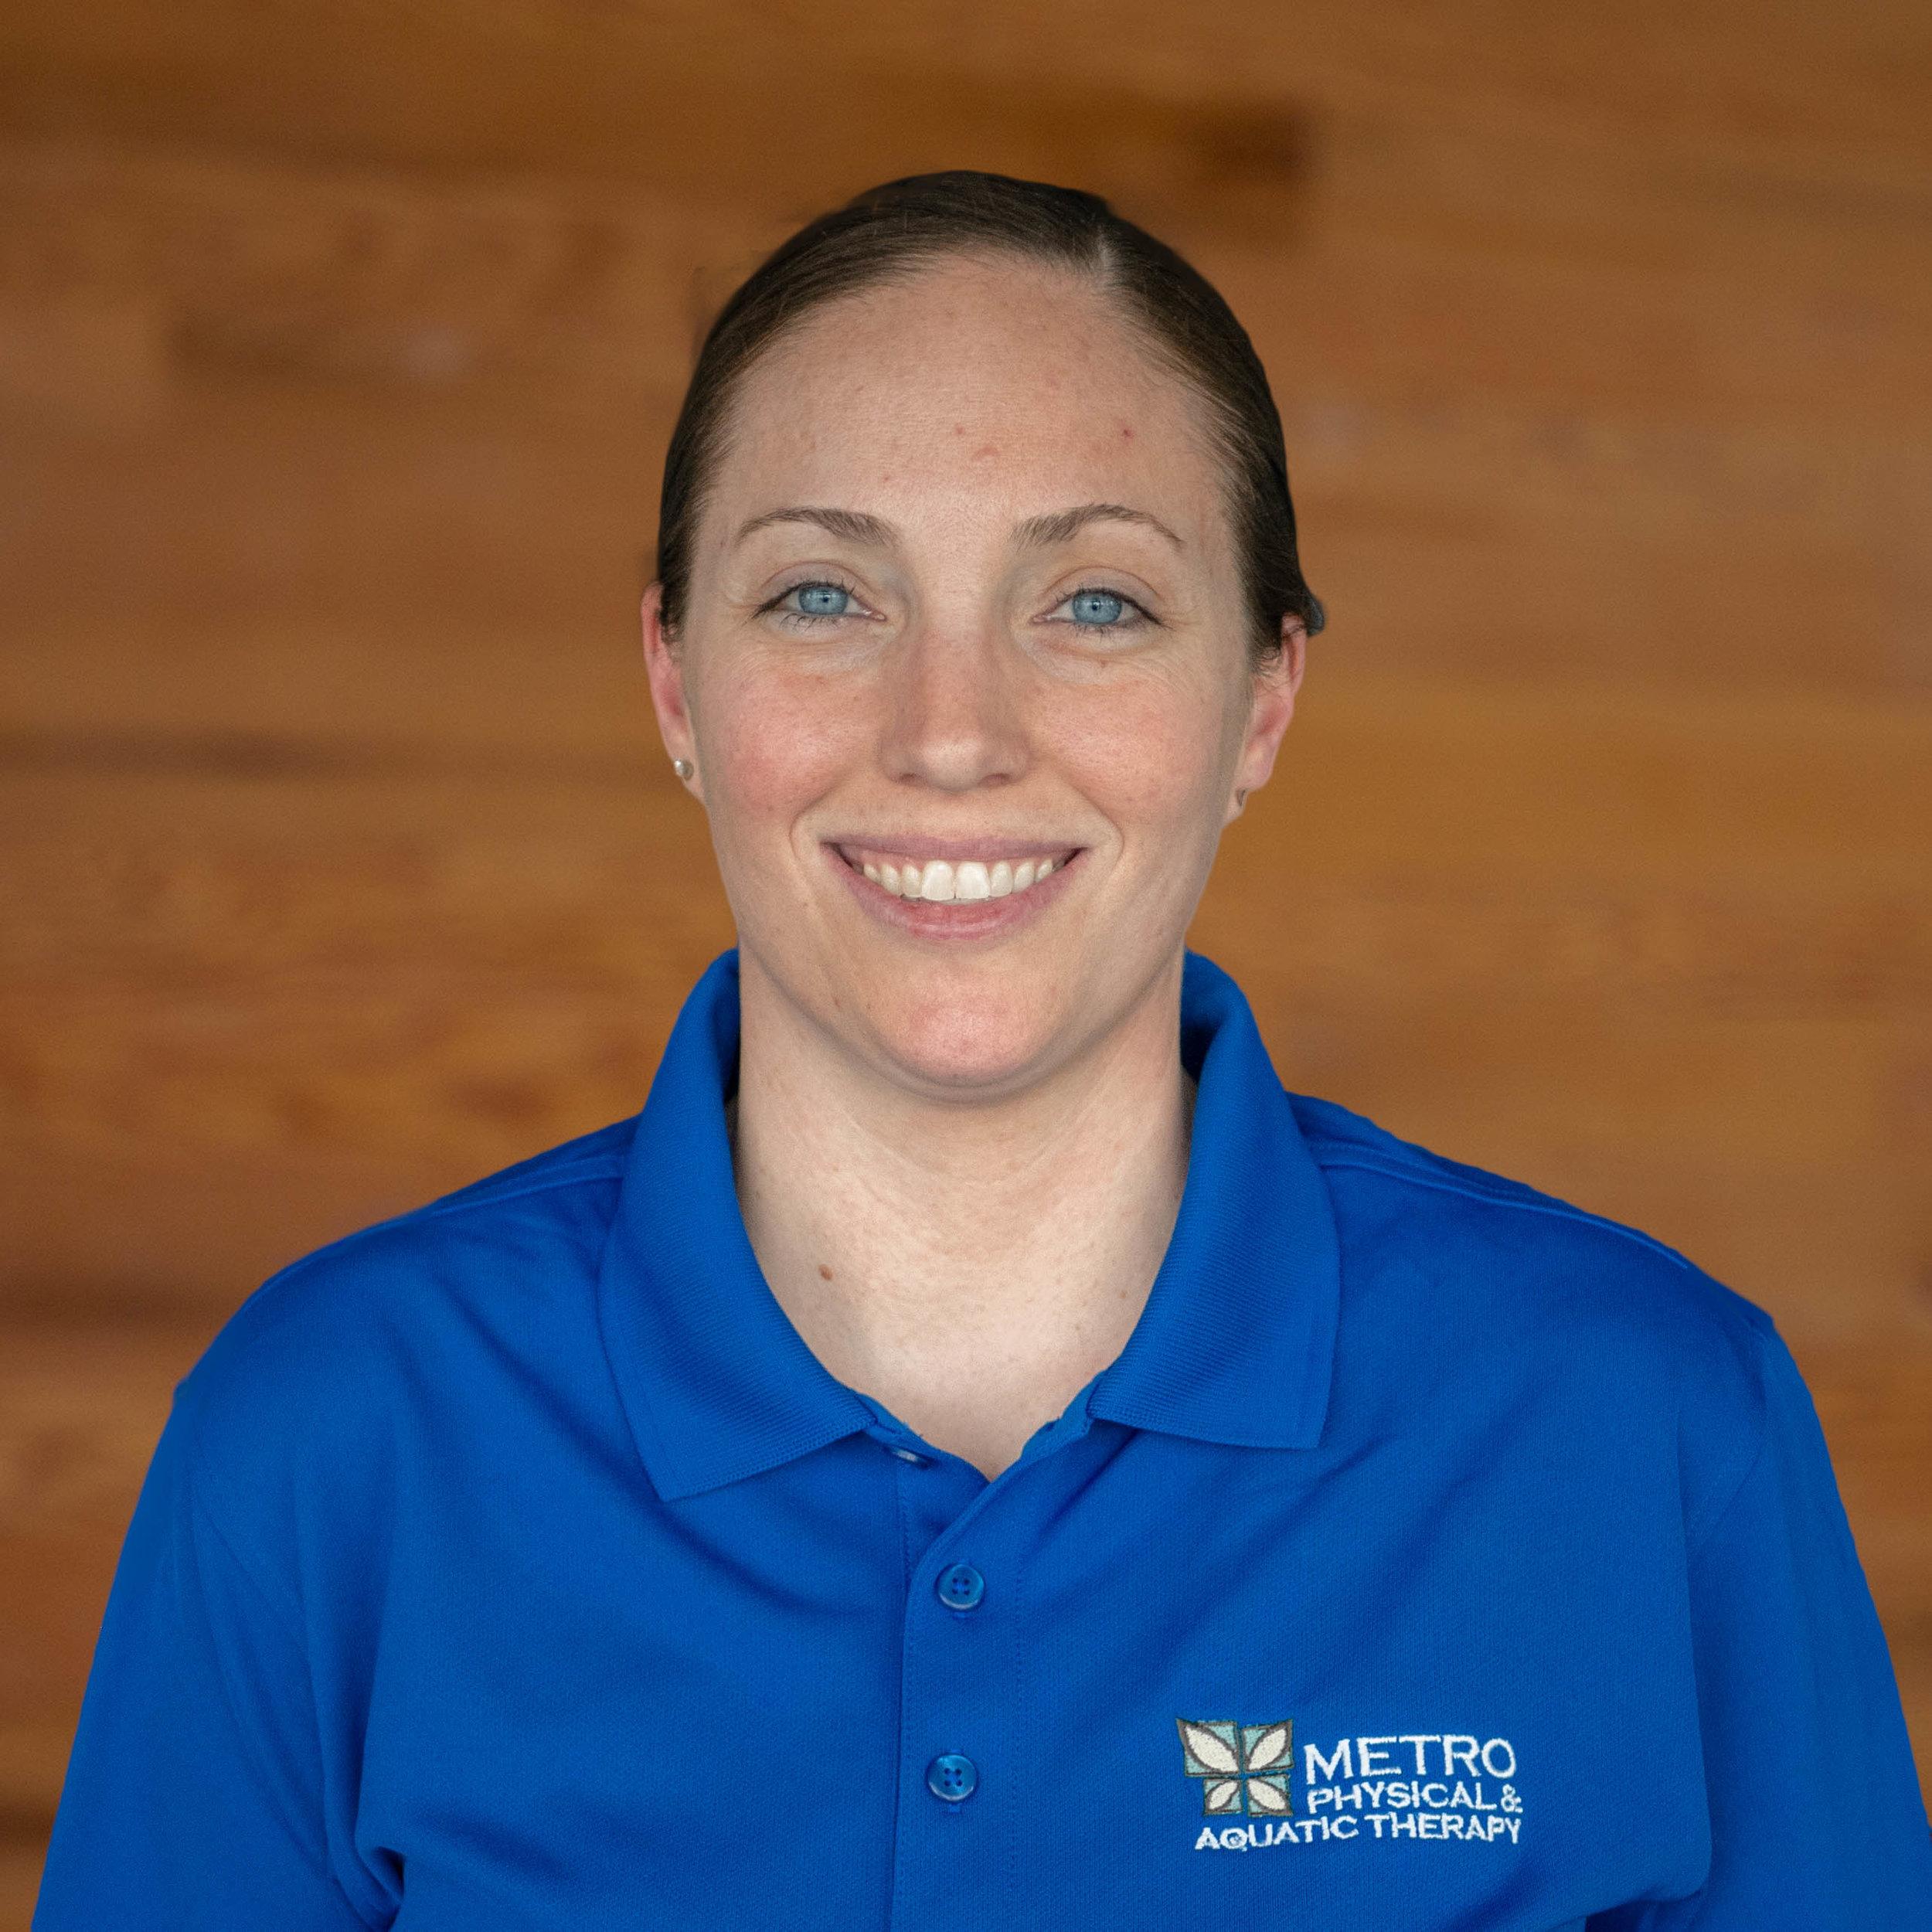 Danielle Simmons, PT, DPT - Orthopedic TherapyWellness & Prevention